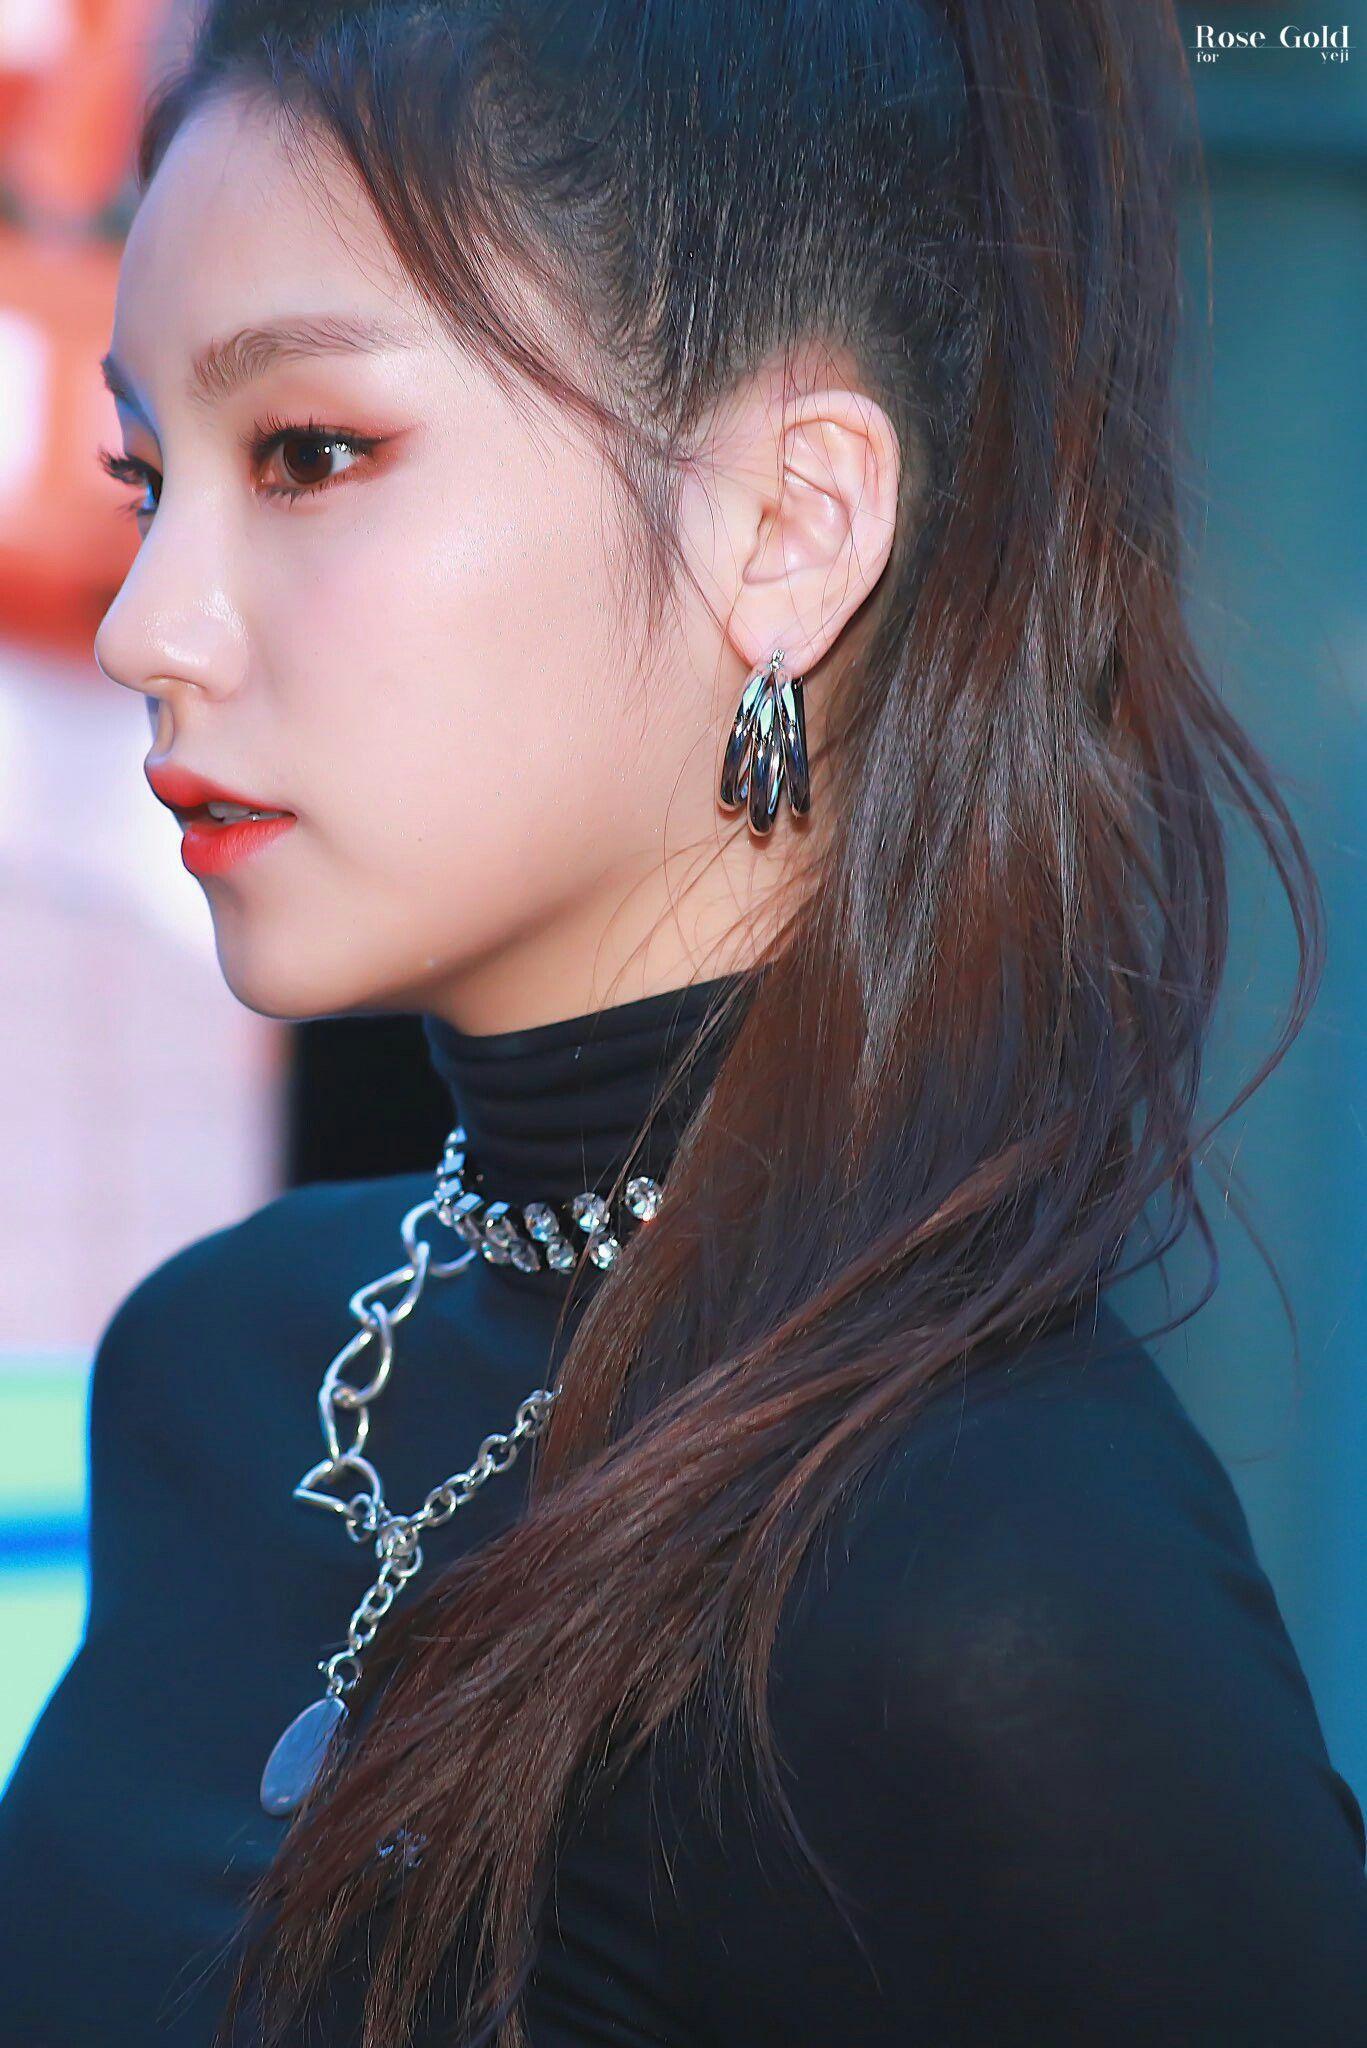 Pin De Bp 99 Em Itzy Em 2019 Brinco Perola K Idol E Dahyun